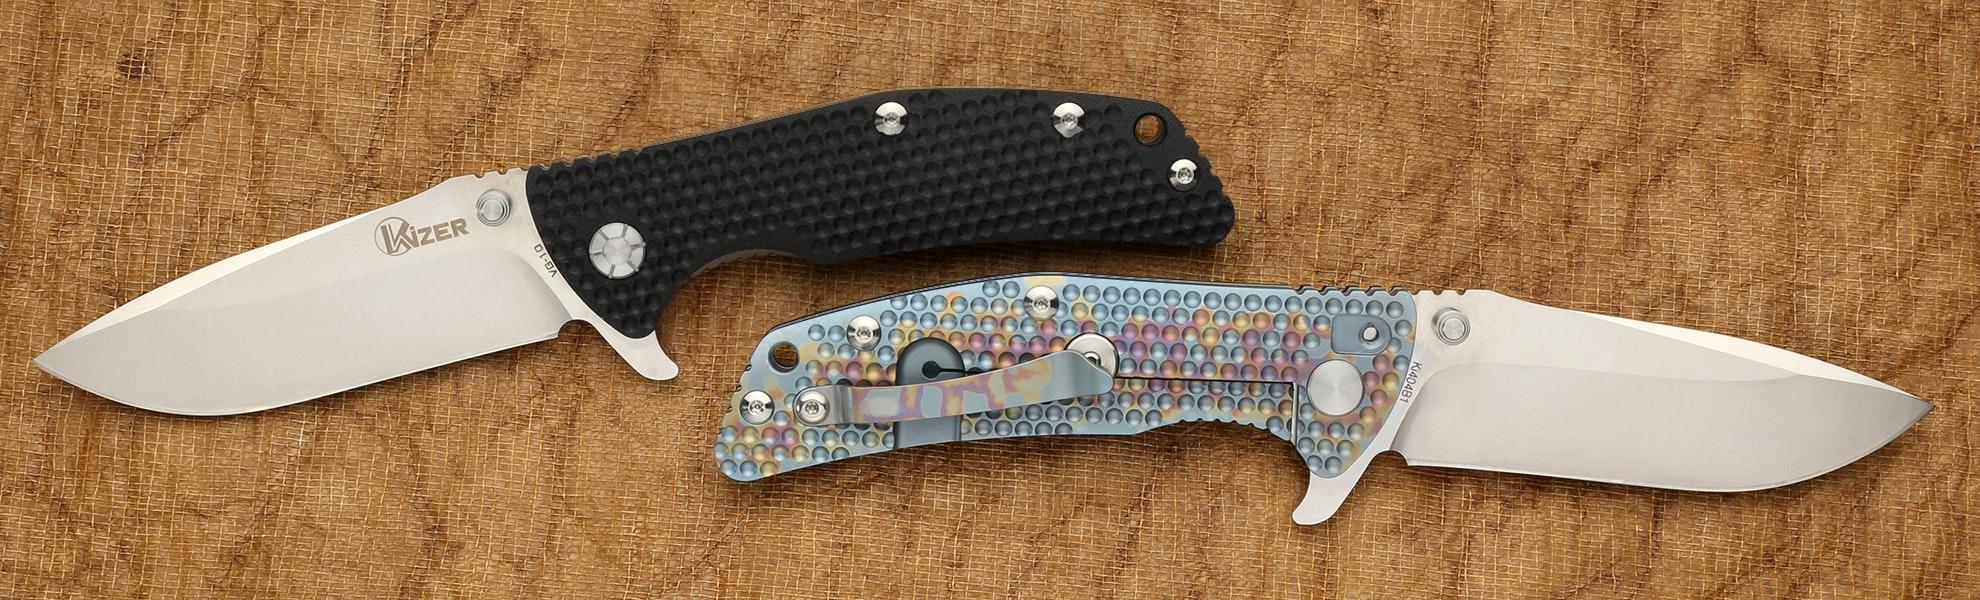 Kizer Ki404B1 & Ki404B2 Anodized Titanium Folder